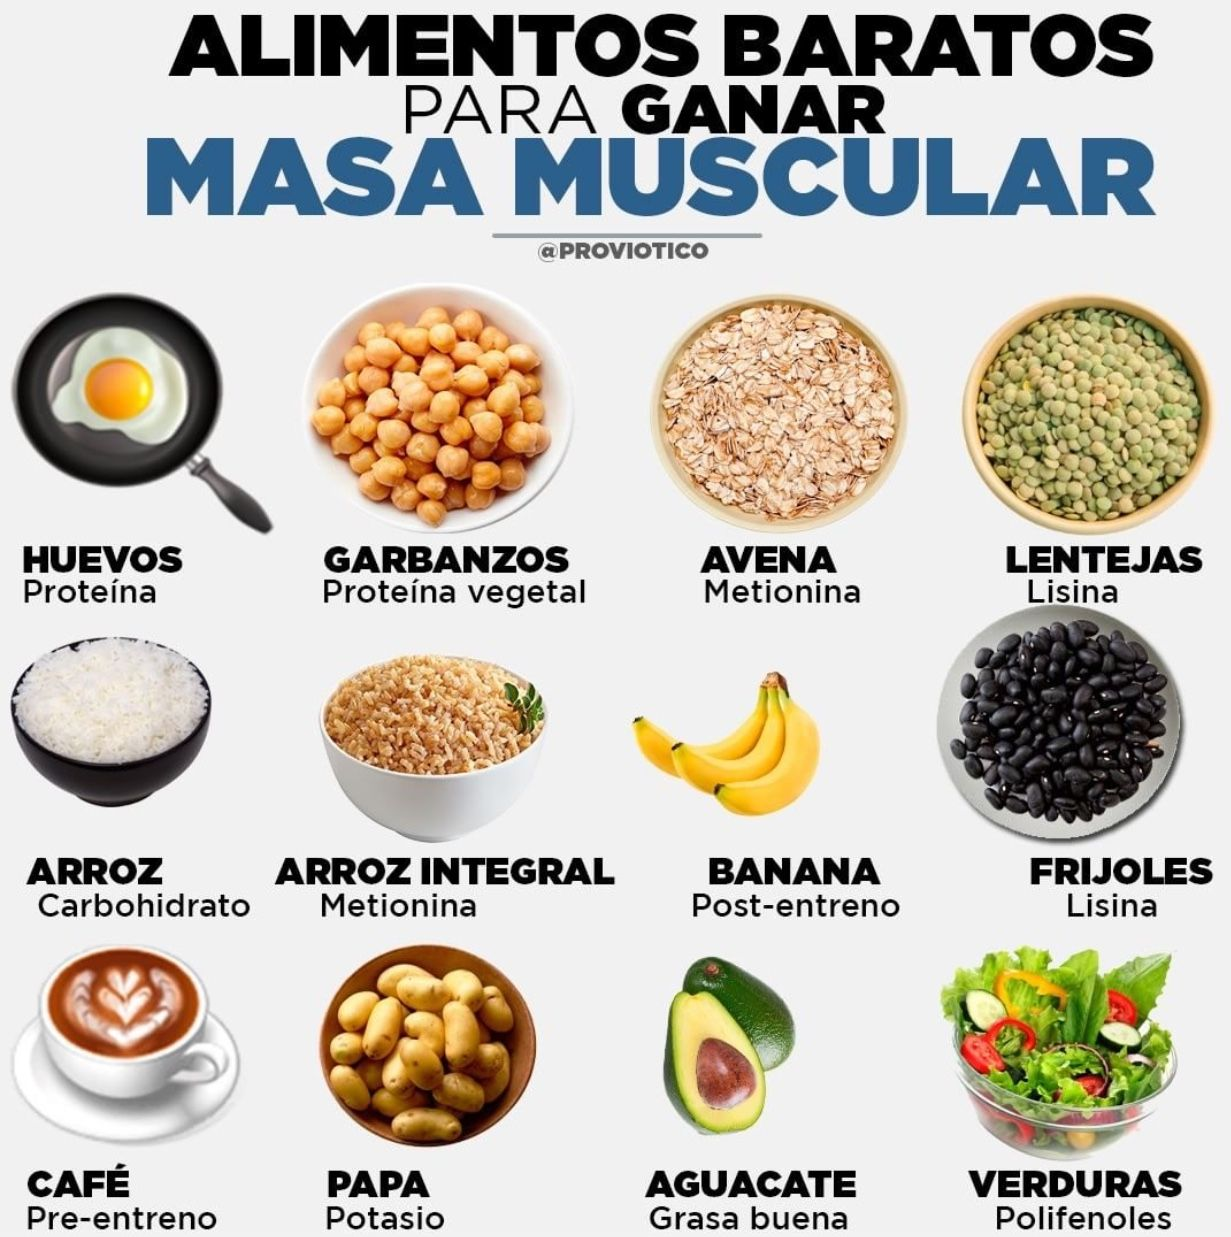 alimentacion vegetariana para ganar masa muscular